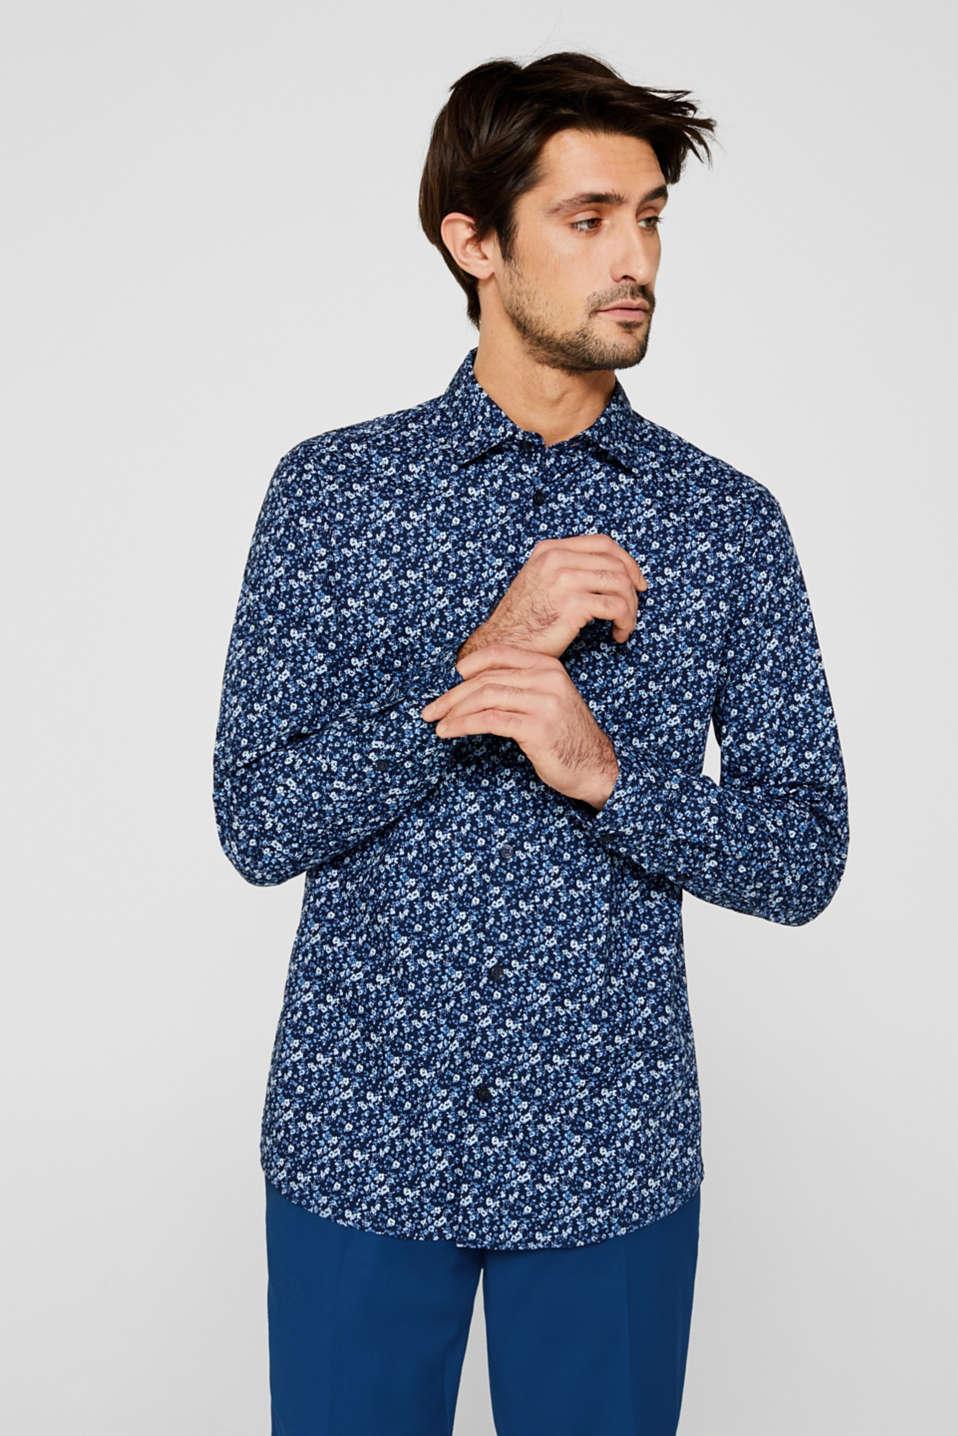 Premium shirt with a floral print, 100% cotton, DARK BLUE 4, detail image number 0